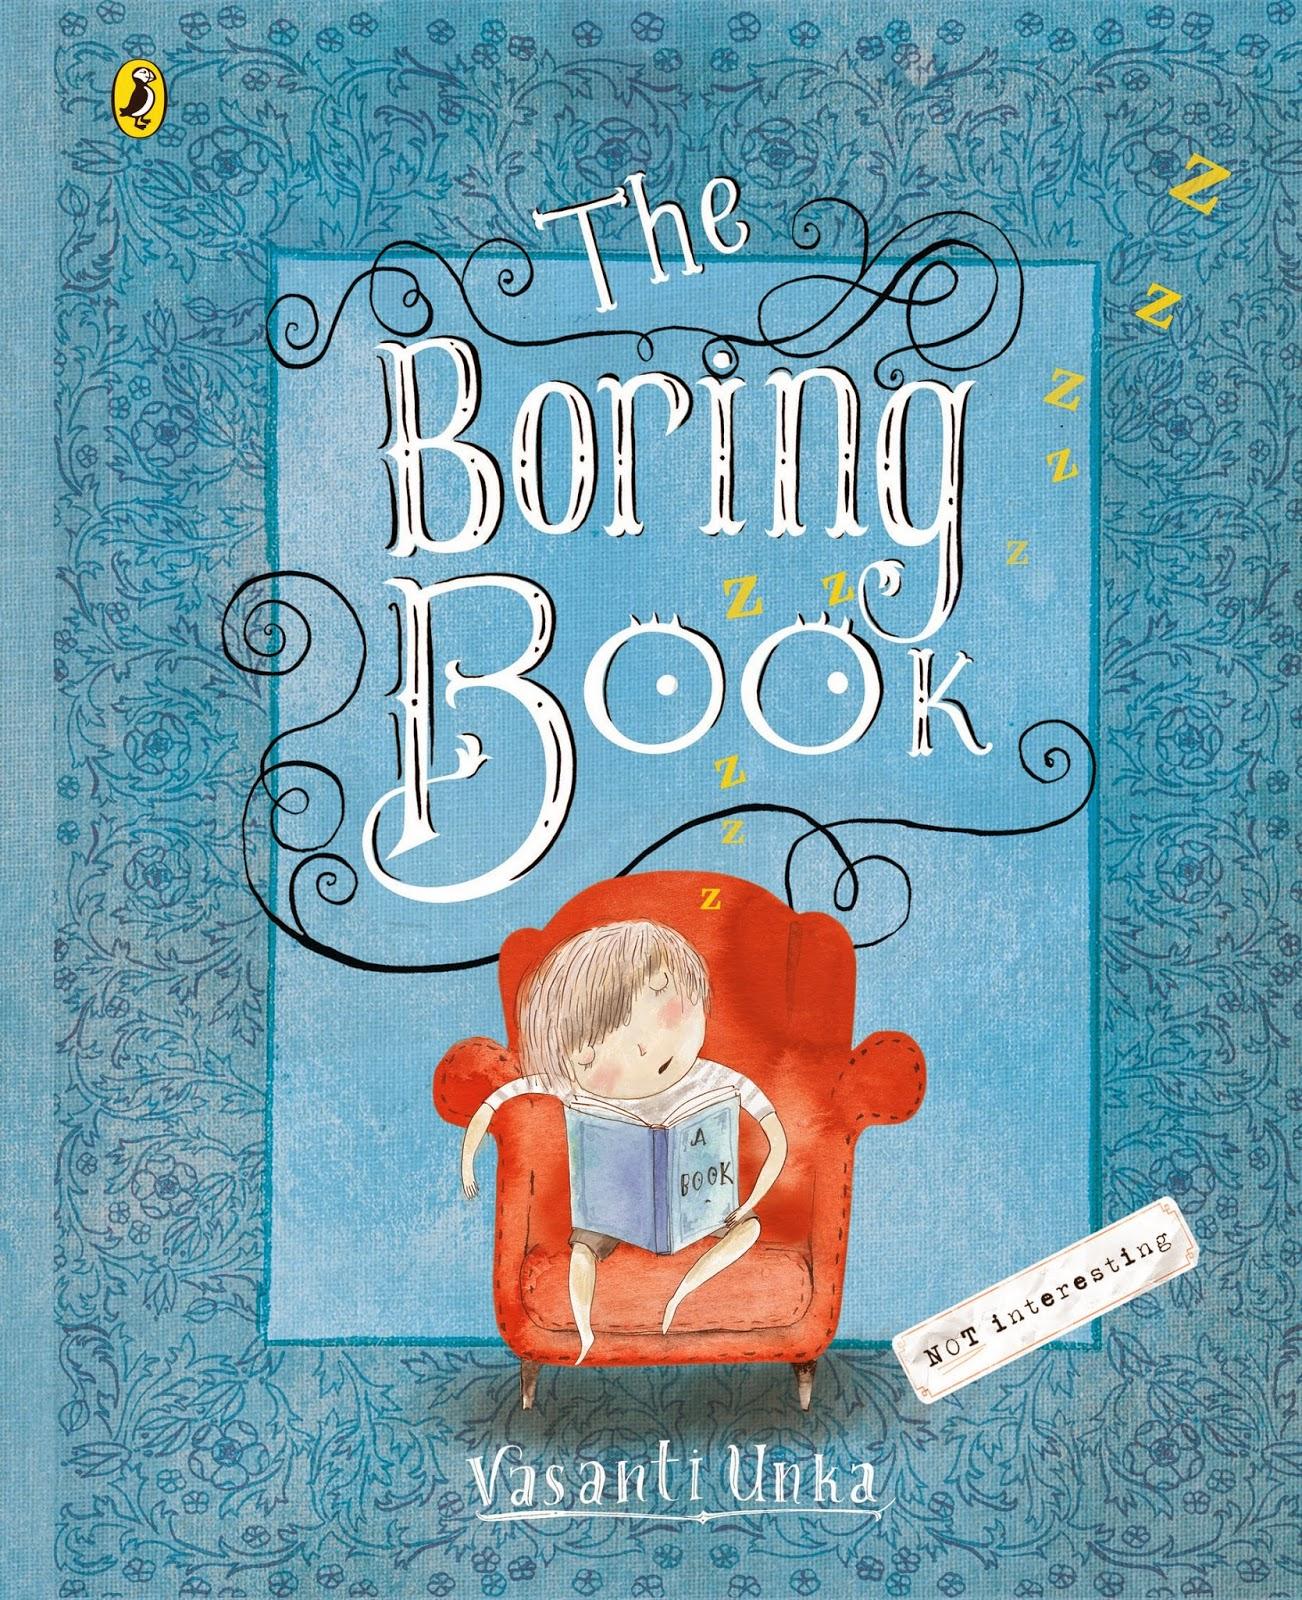 Book Covering Nz : St brendan s school library nz post children book